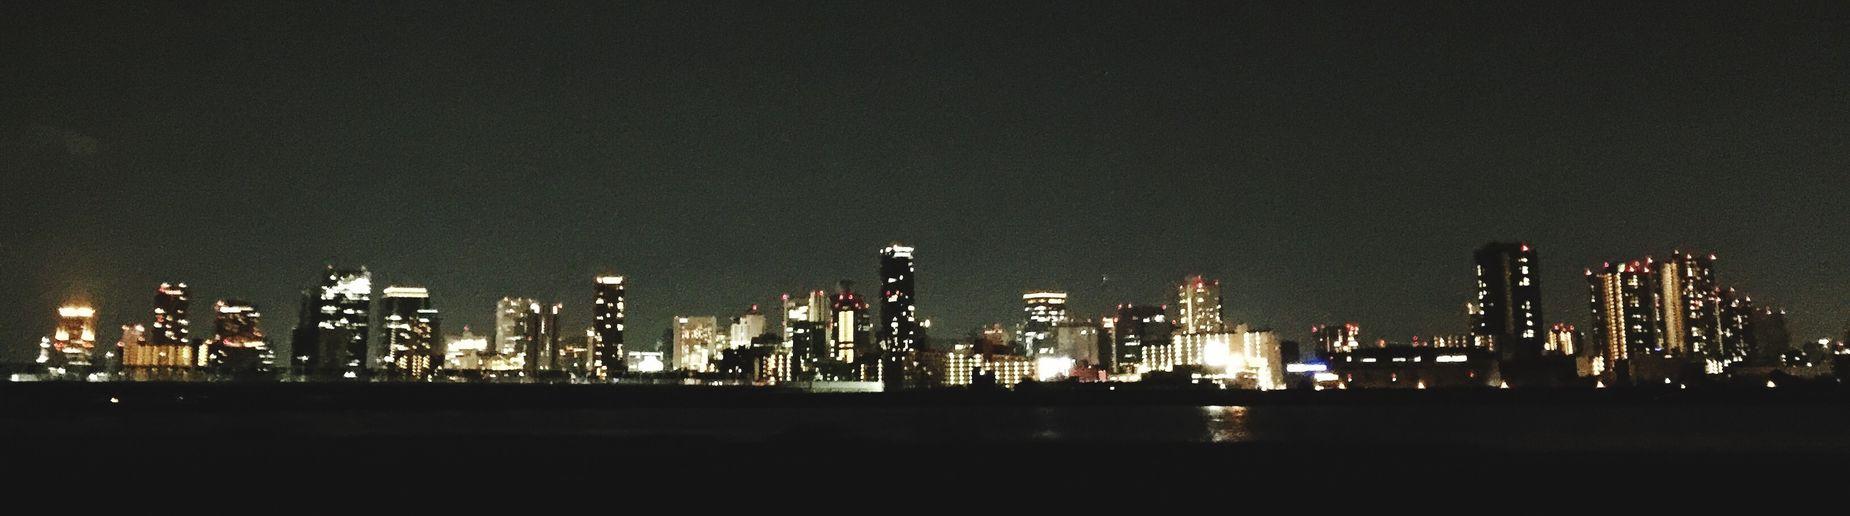 Umeda from Nishiyodogawa. Nightphotography Cityscape Osaka,Japan